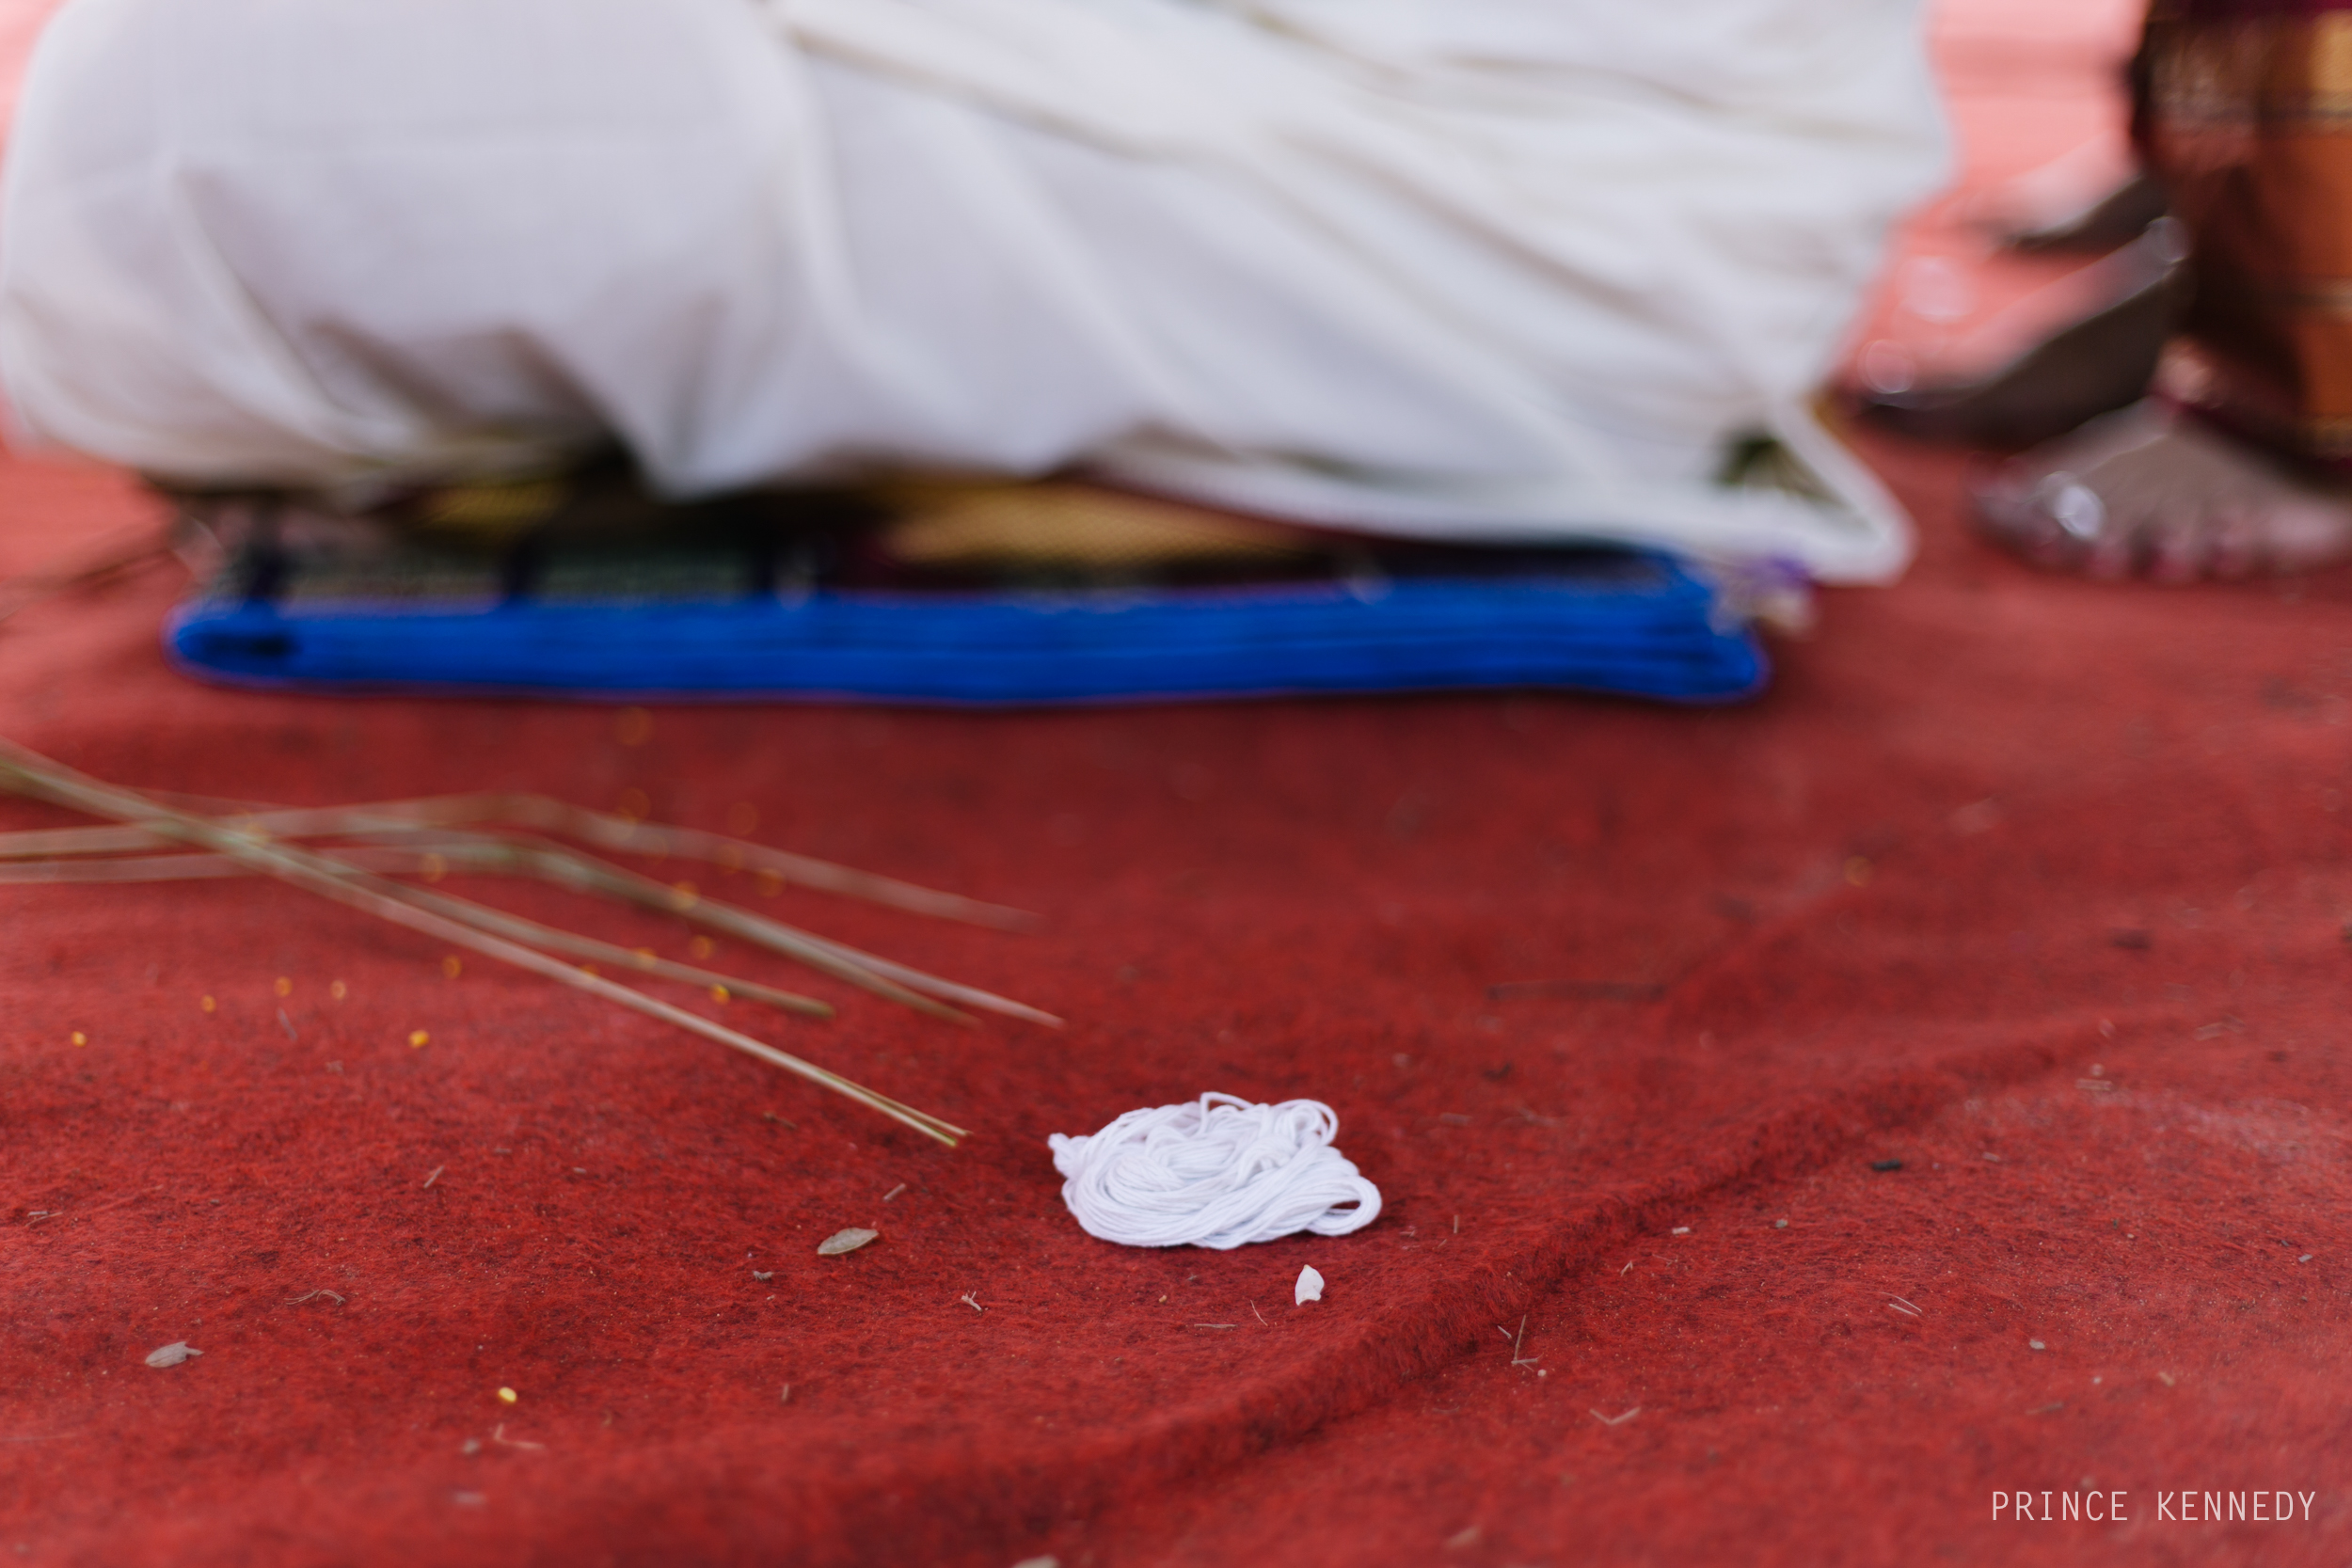 Athmajja-Nithesh-Engagement-Couple-Portrait-Portraiture-Wedding-Couple-Portrait-Chennai-Photographer-Candid-Photography-Destination-Best-Prince-Kennedy-Photography-17.jpg